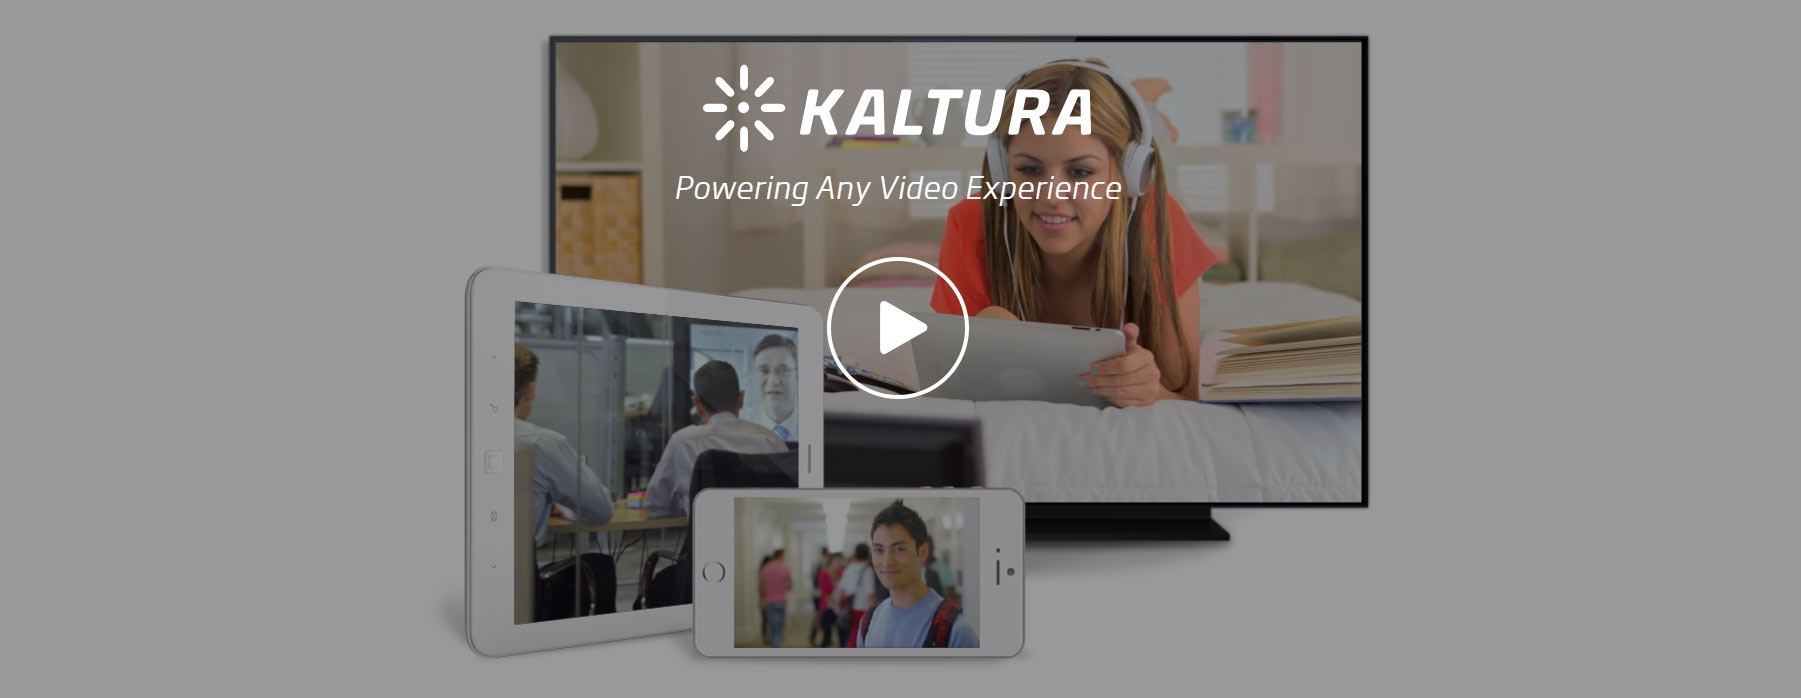 HTML5 Video – Kaltura